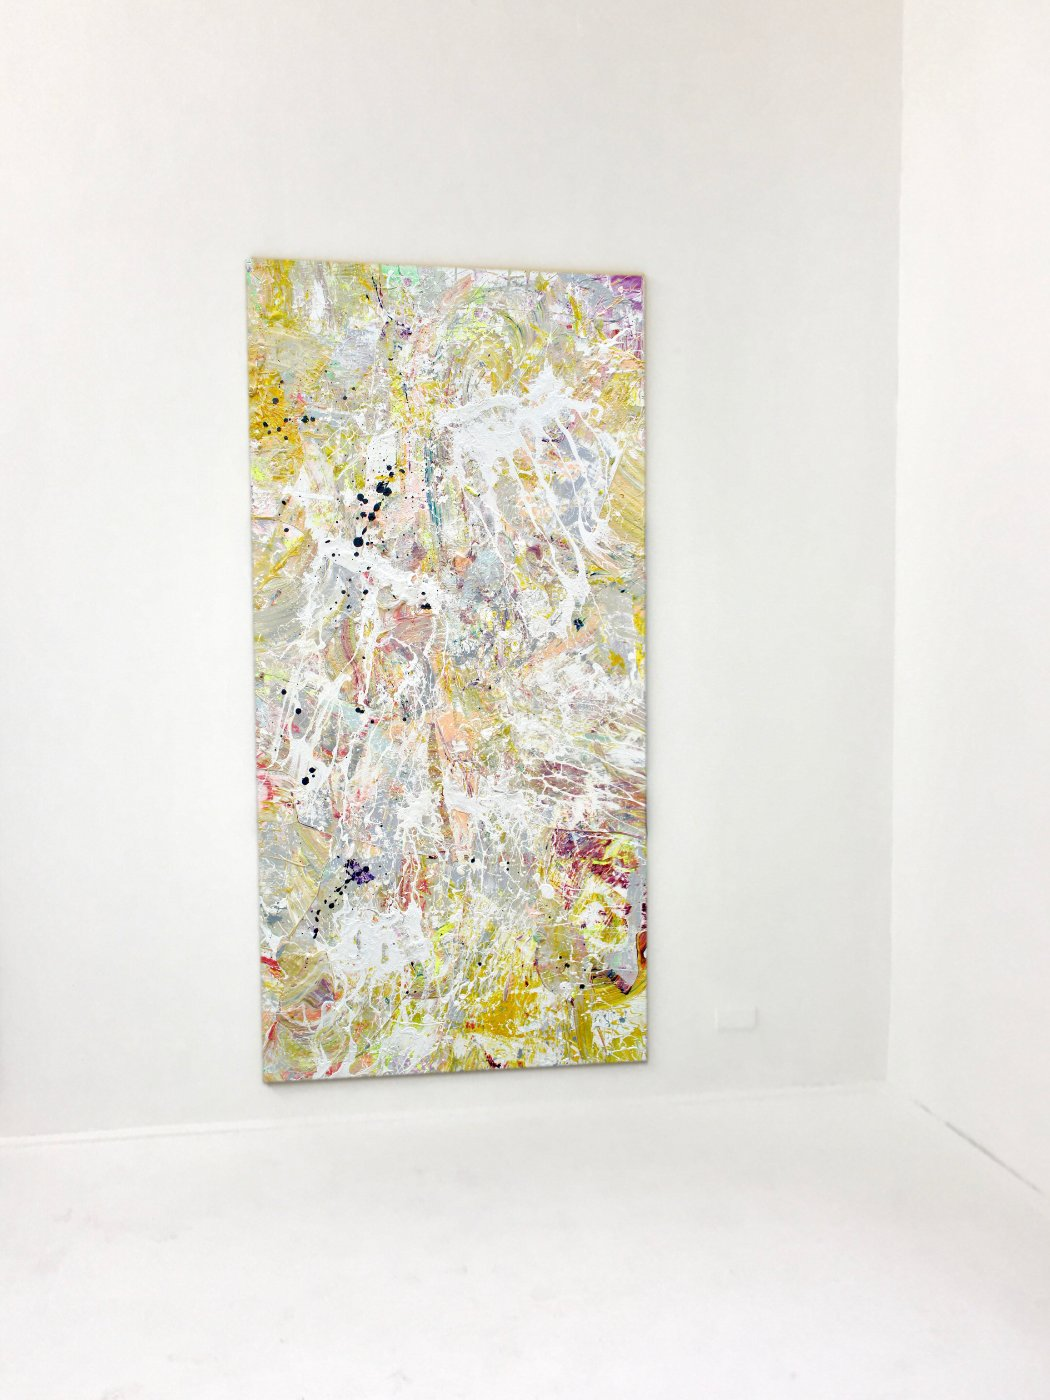 Und ich will Leben Theresa Kallrath Kunst Künstler Düsseldorf Paris Atelier Studio Kallart